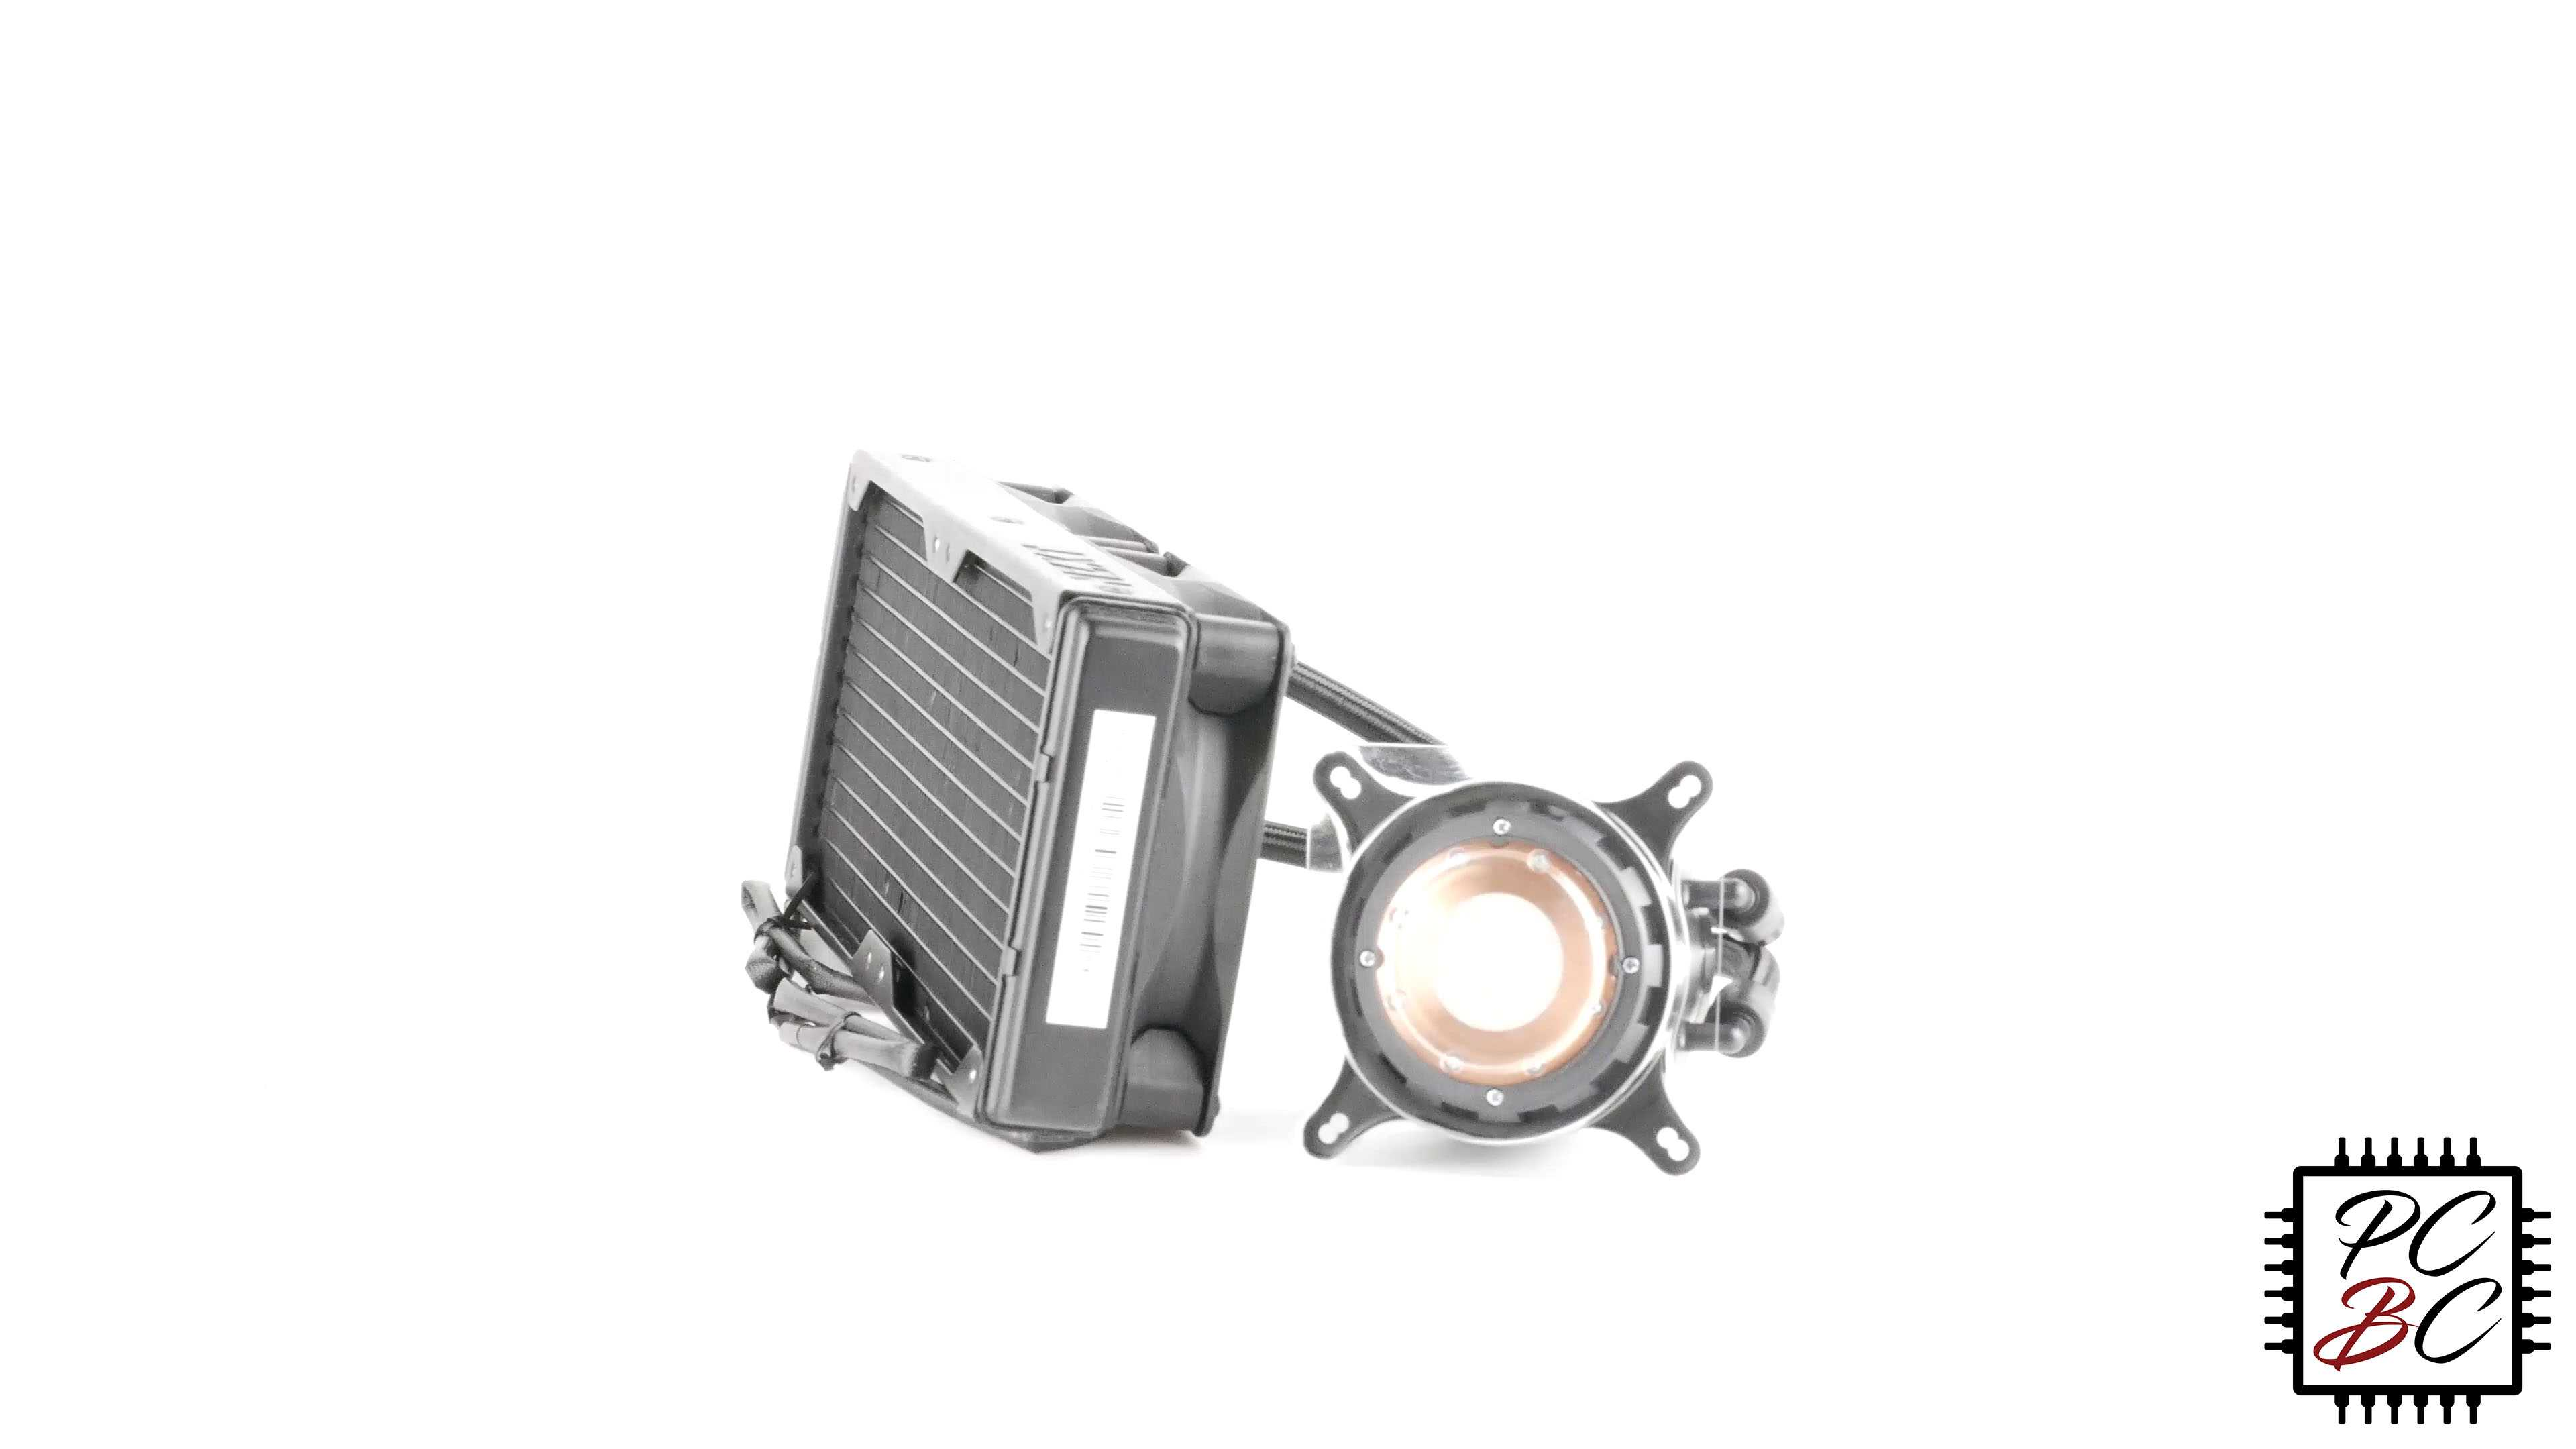 All In One Watercooler Test 2018 Nine Cpu Coolers A Detailed The Radio Builder Mw Receiverreflexive Radio2t Nzxt Kraken X52